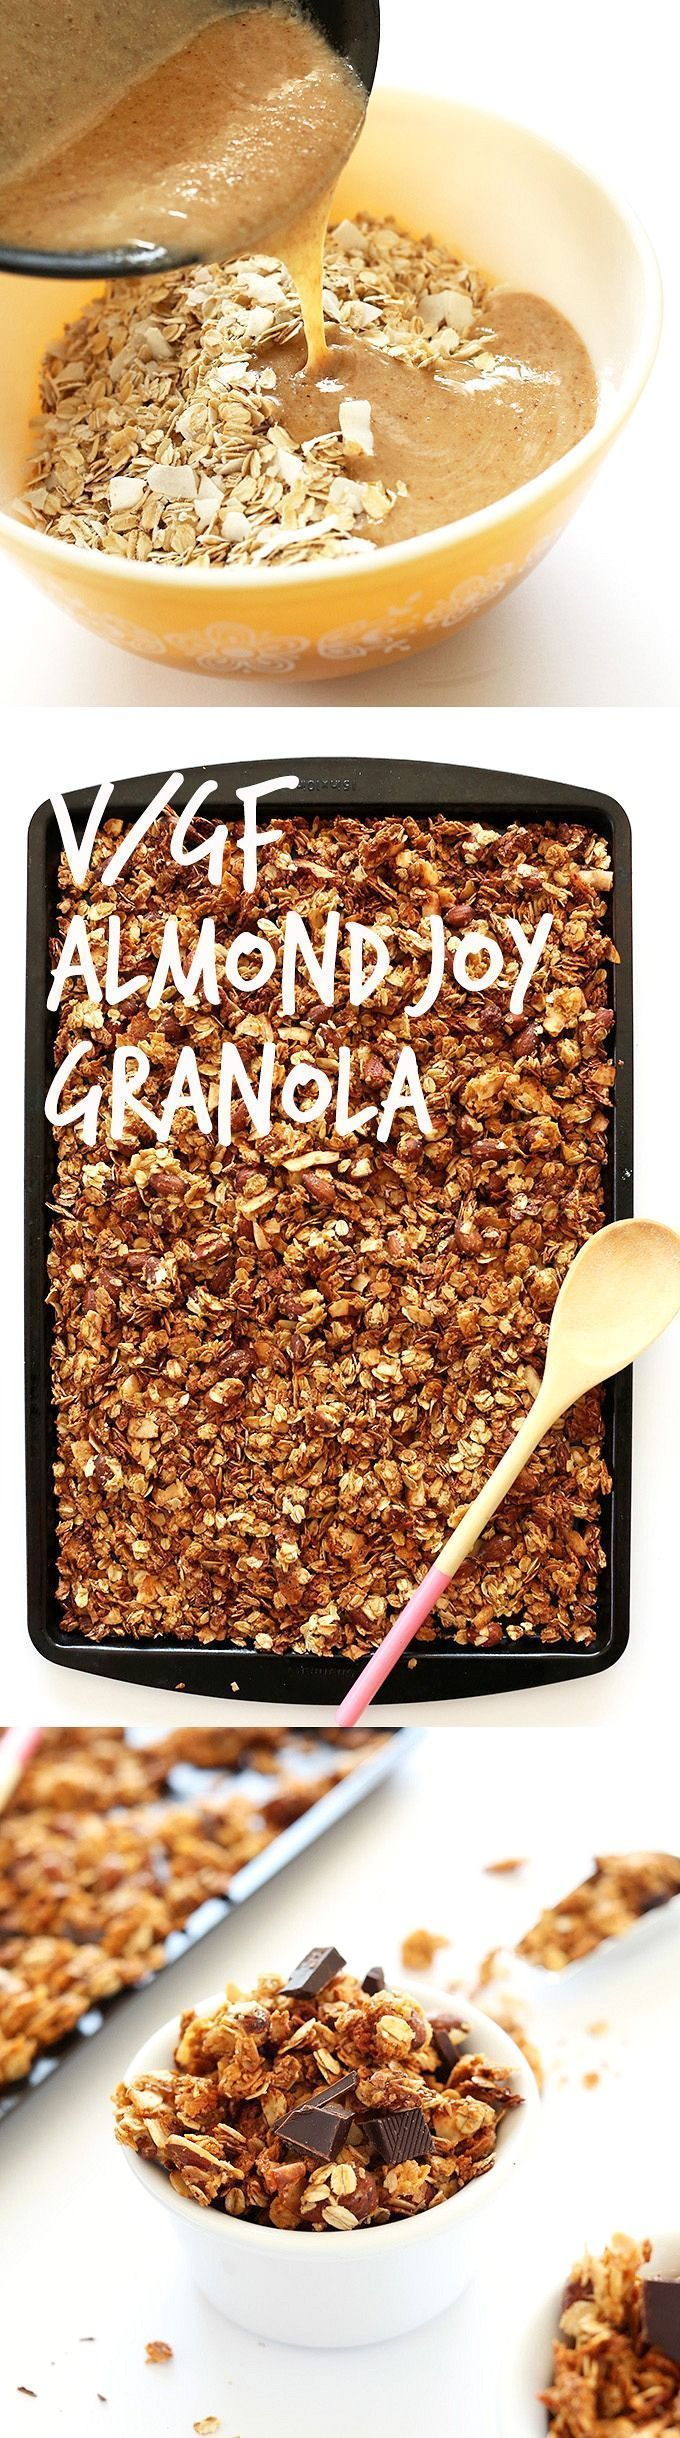 Joy Granola SALTY-SWEET and HEALTHY Almond Joy Granola! 9 ingredients, 30 minutesSALTY-SWEET and HEALTHY Almond Joy Granola! 9 ingredients, 30 minutes